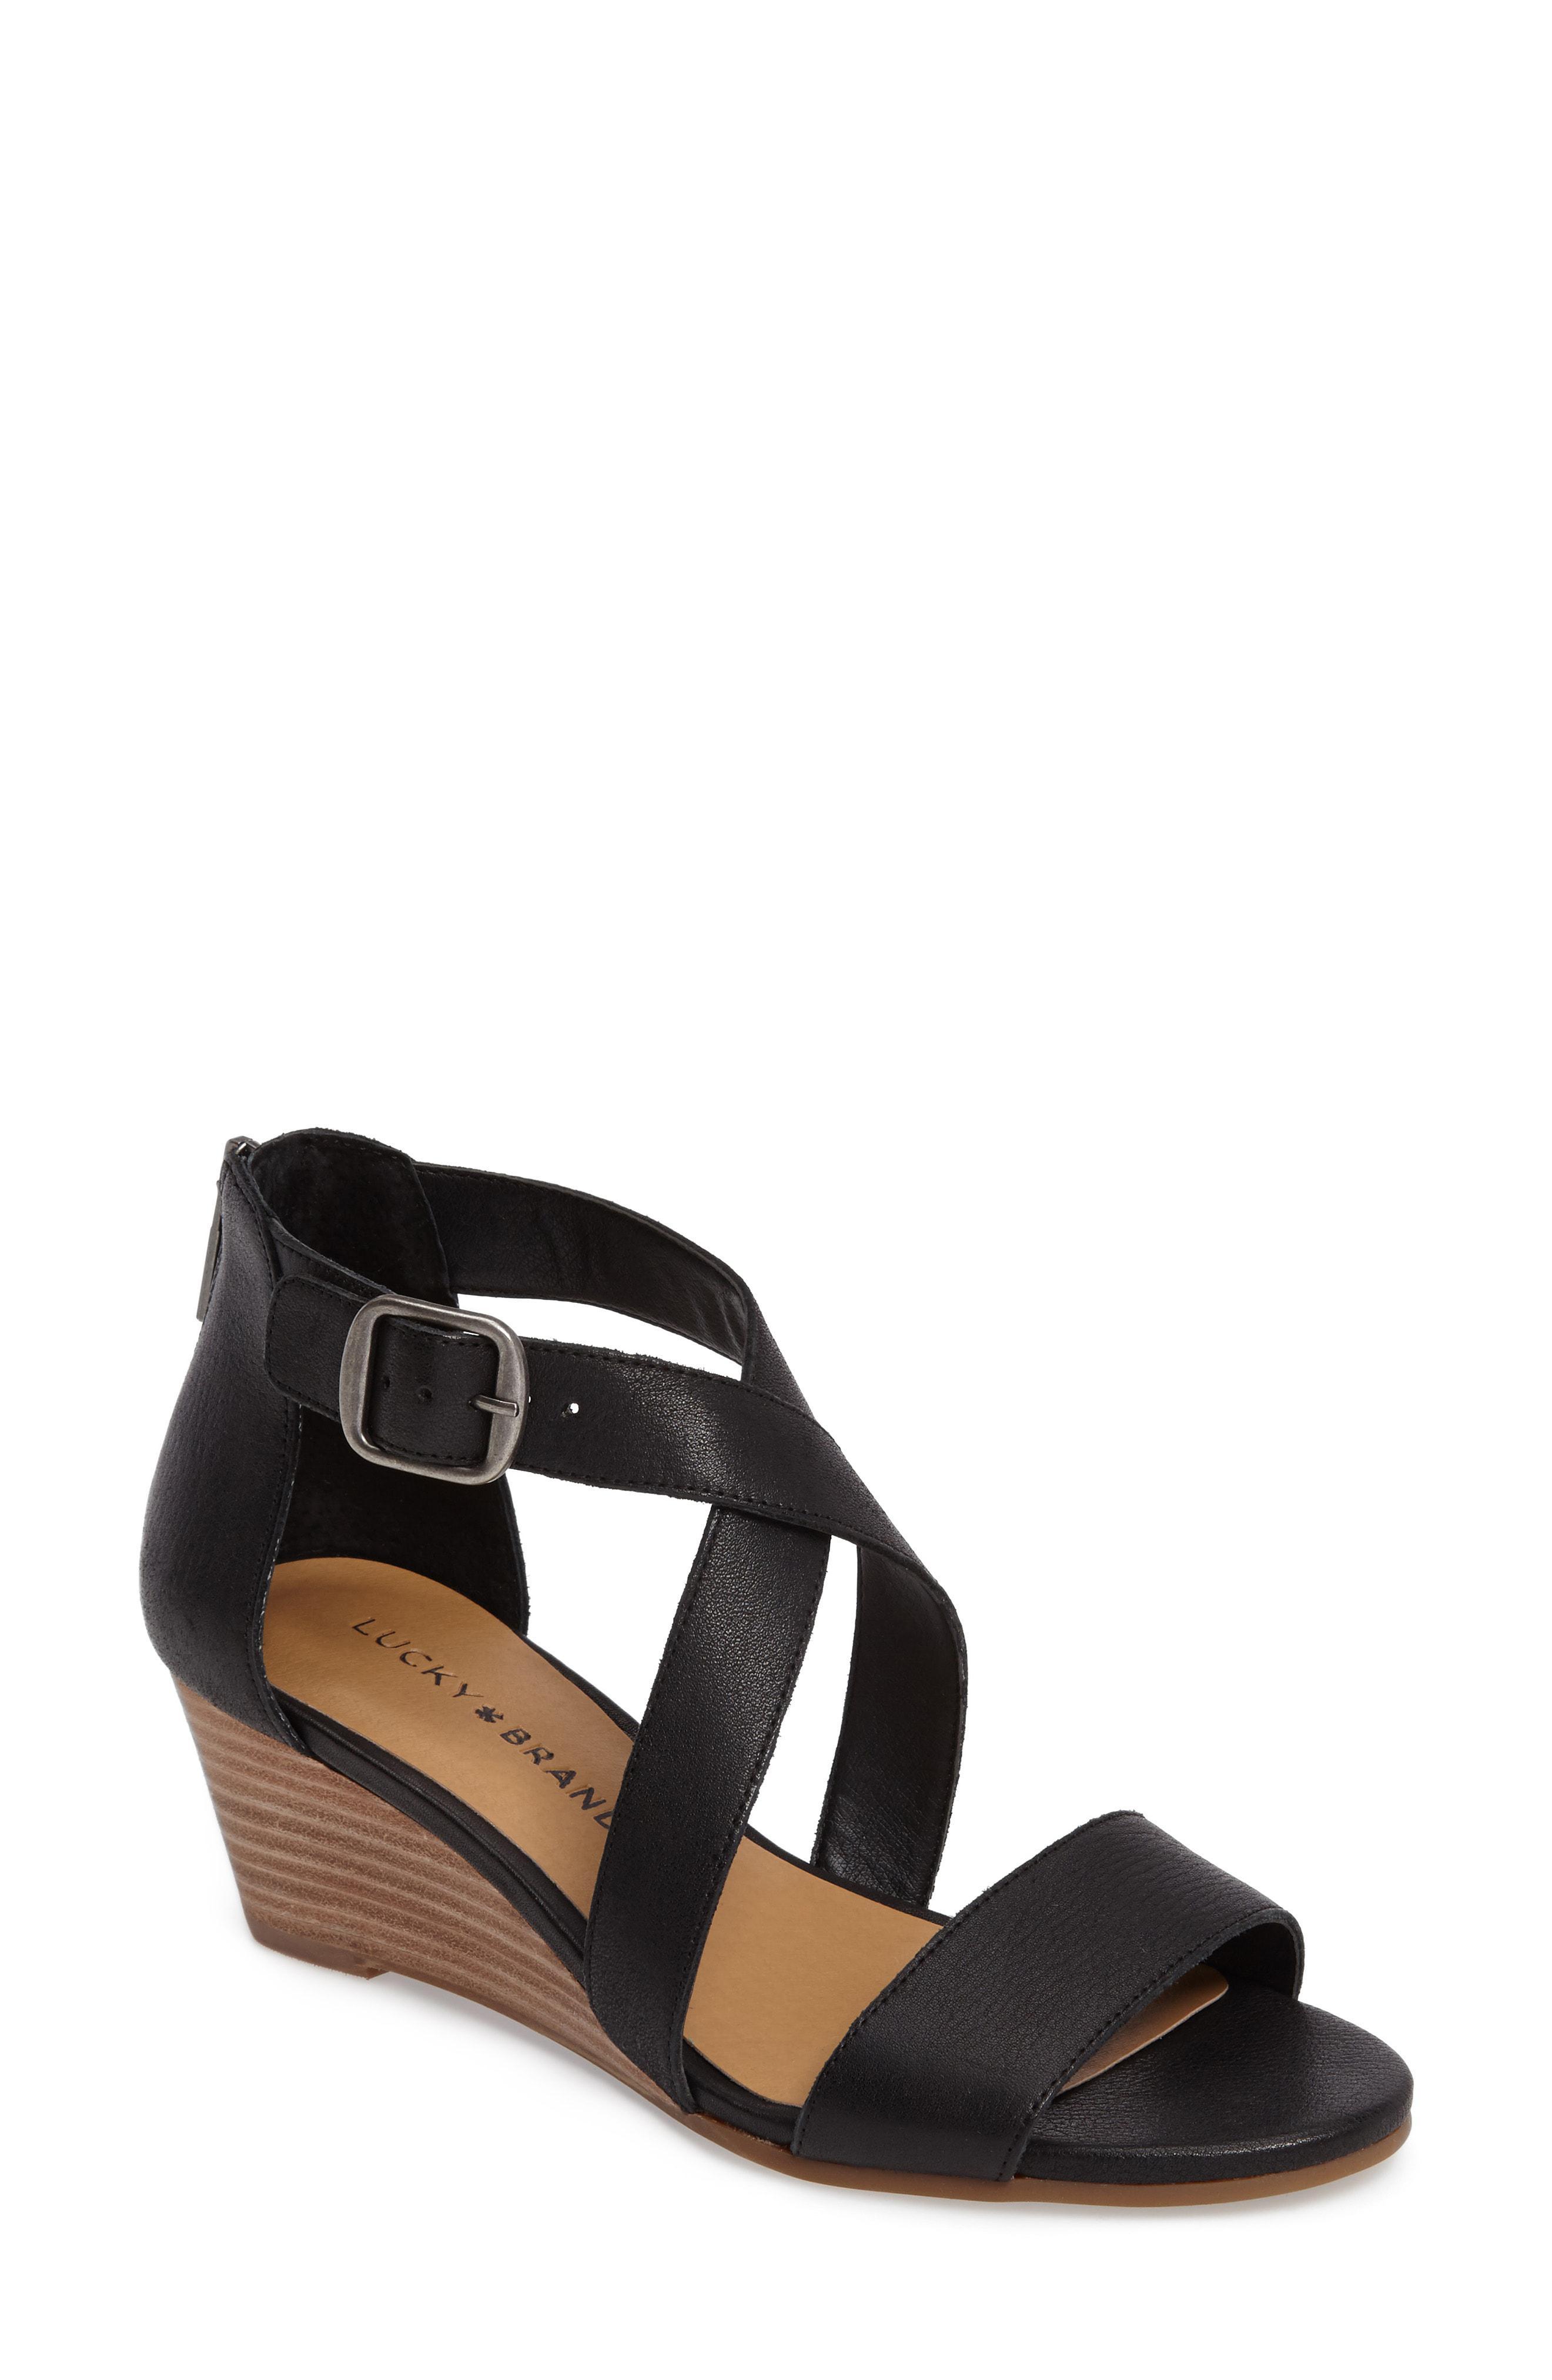 81b83d59b52c Lyst - Lucky Brand Jenley Wedge Sandal in Brown